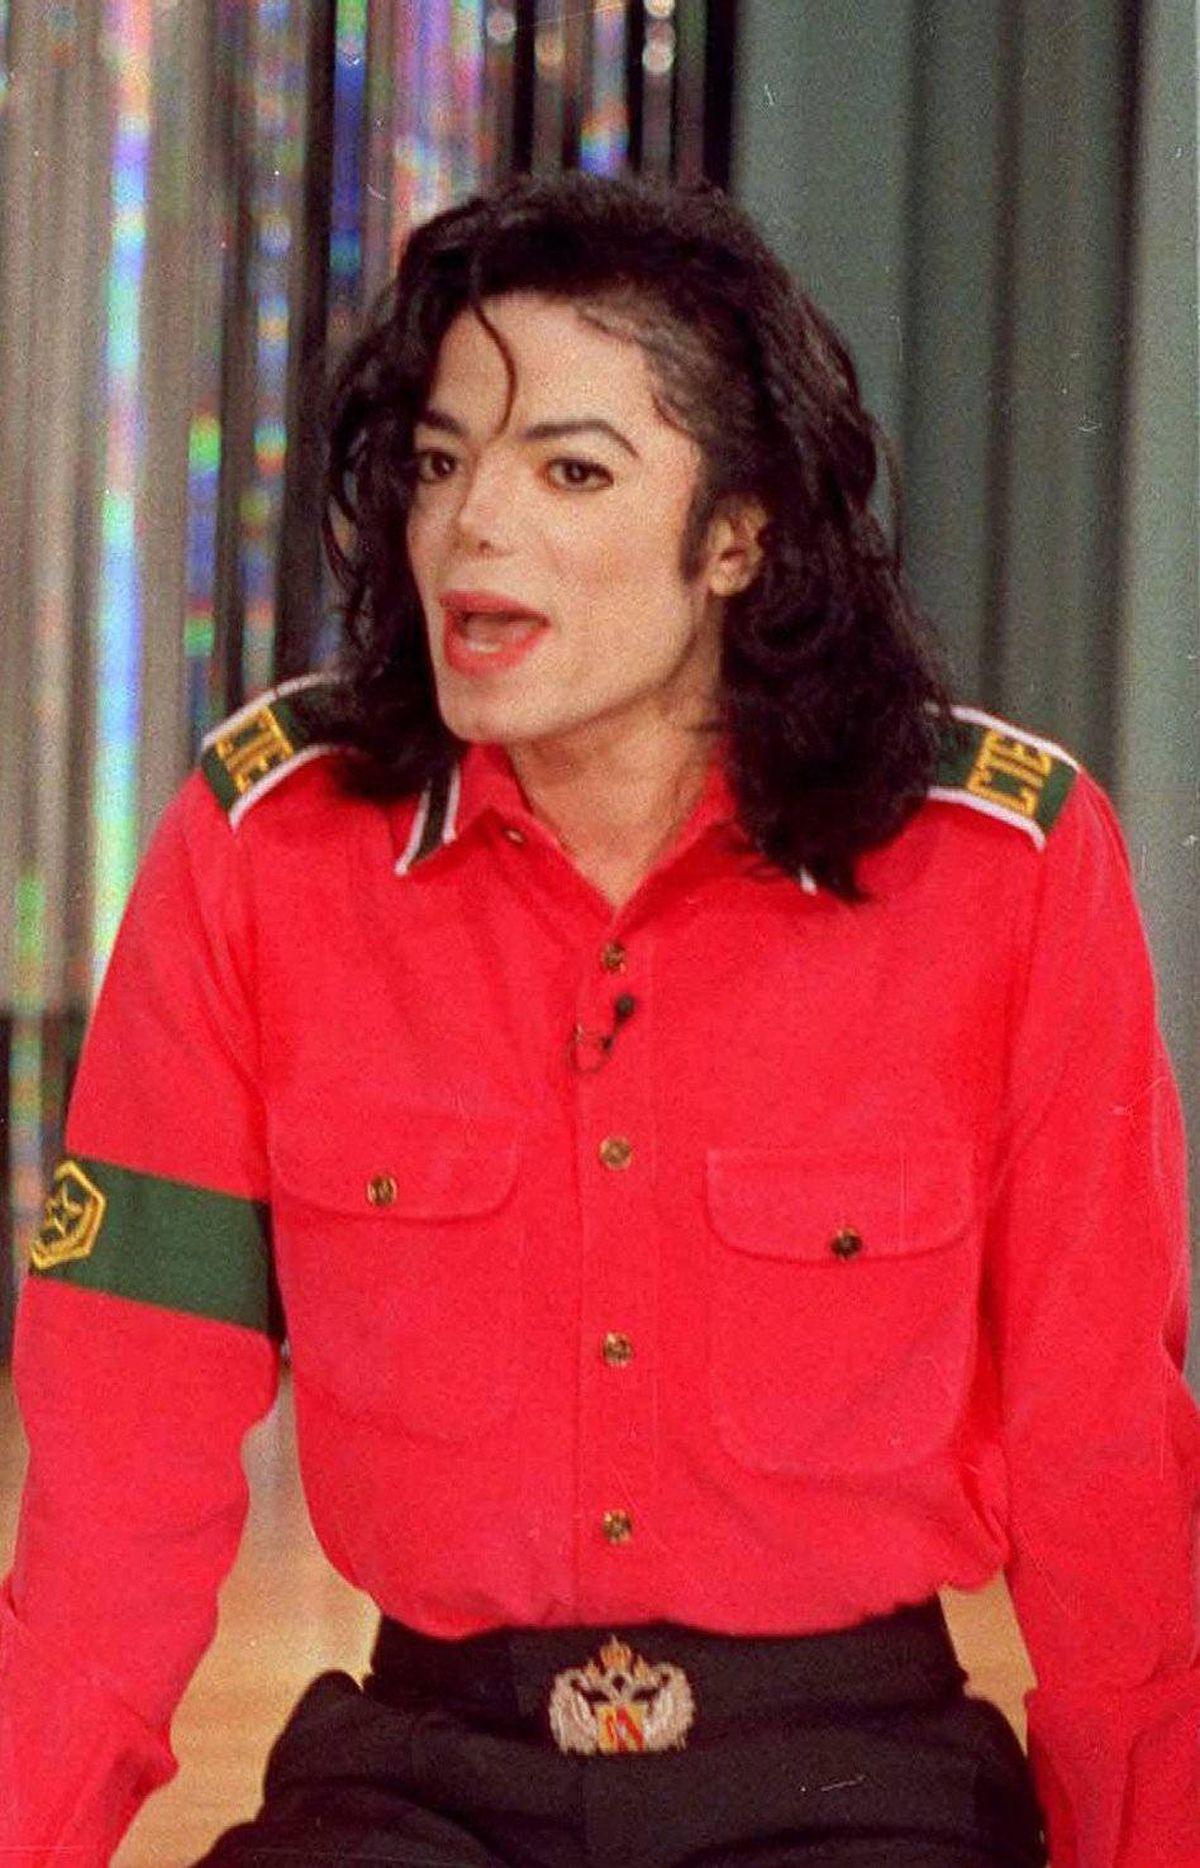 Michael Jackson's third child is named Prince Michael Jackson II. His nickname is Blanket.